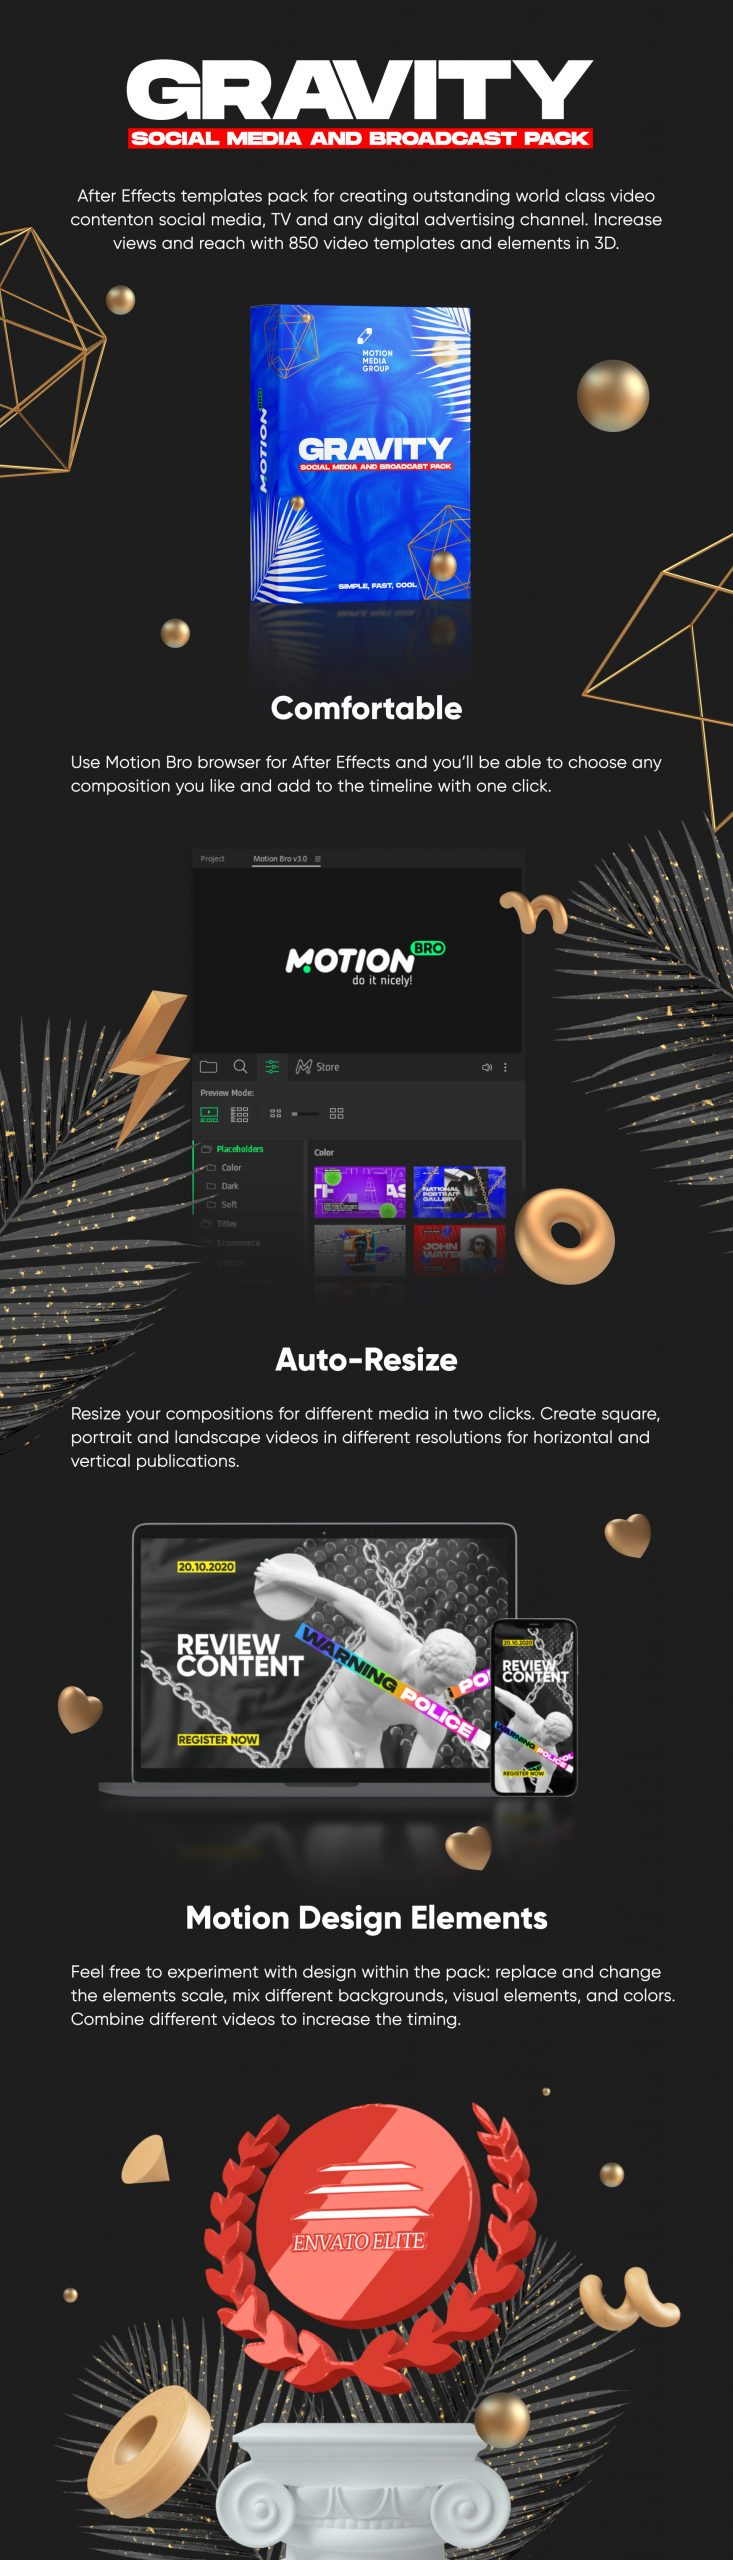 《AE扩展脚本:Gravity 850个创意文字标题广告海报设计促销视频社交媒体纹理背景等图形元素包(Motion Bro)》